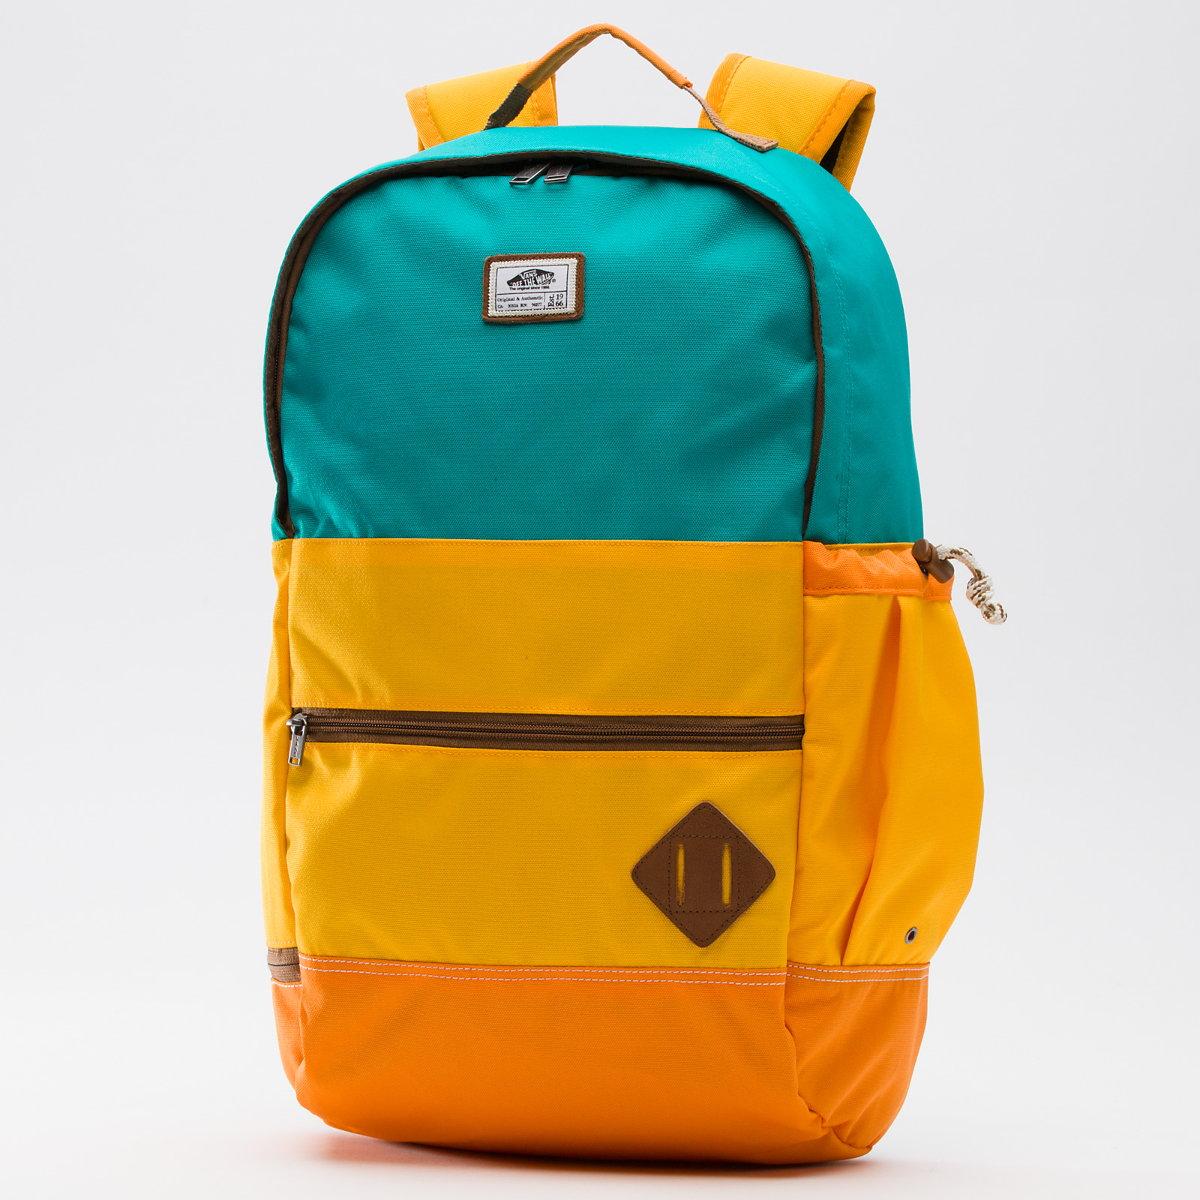 38bdc6d2d4 Plecak VANS Van Doren II backpack (blue grass) - Sklep PRLBMX